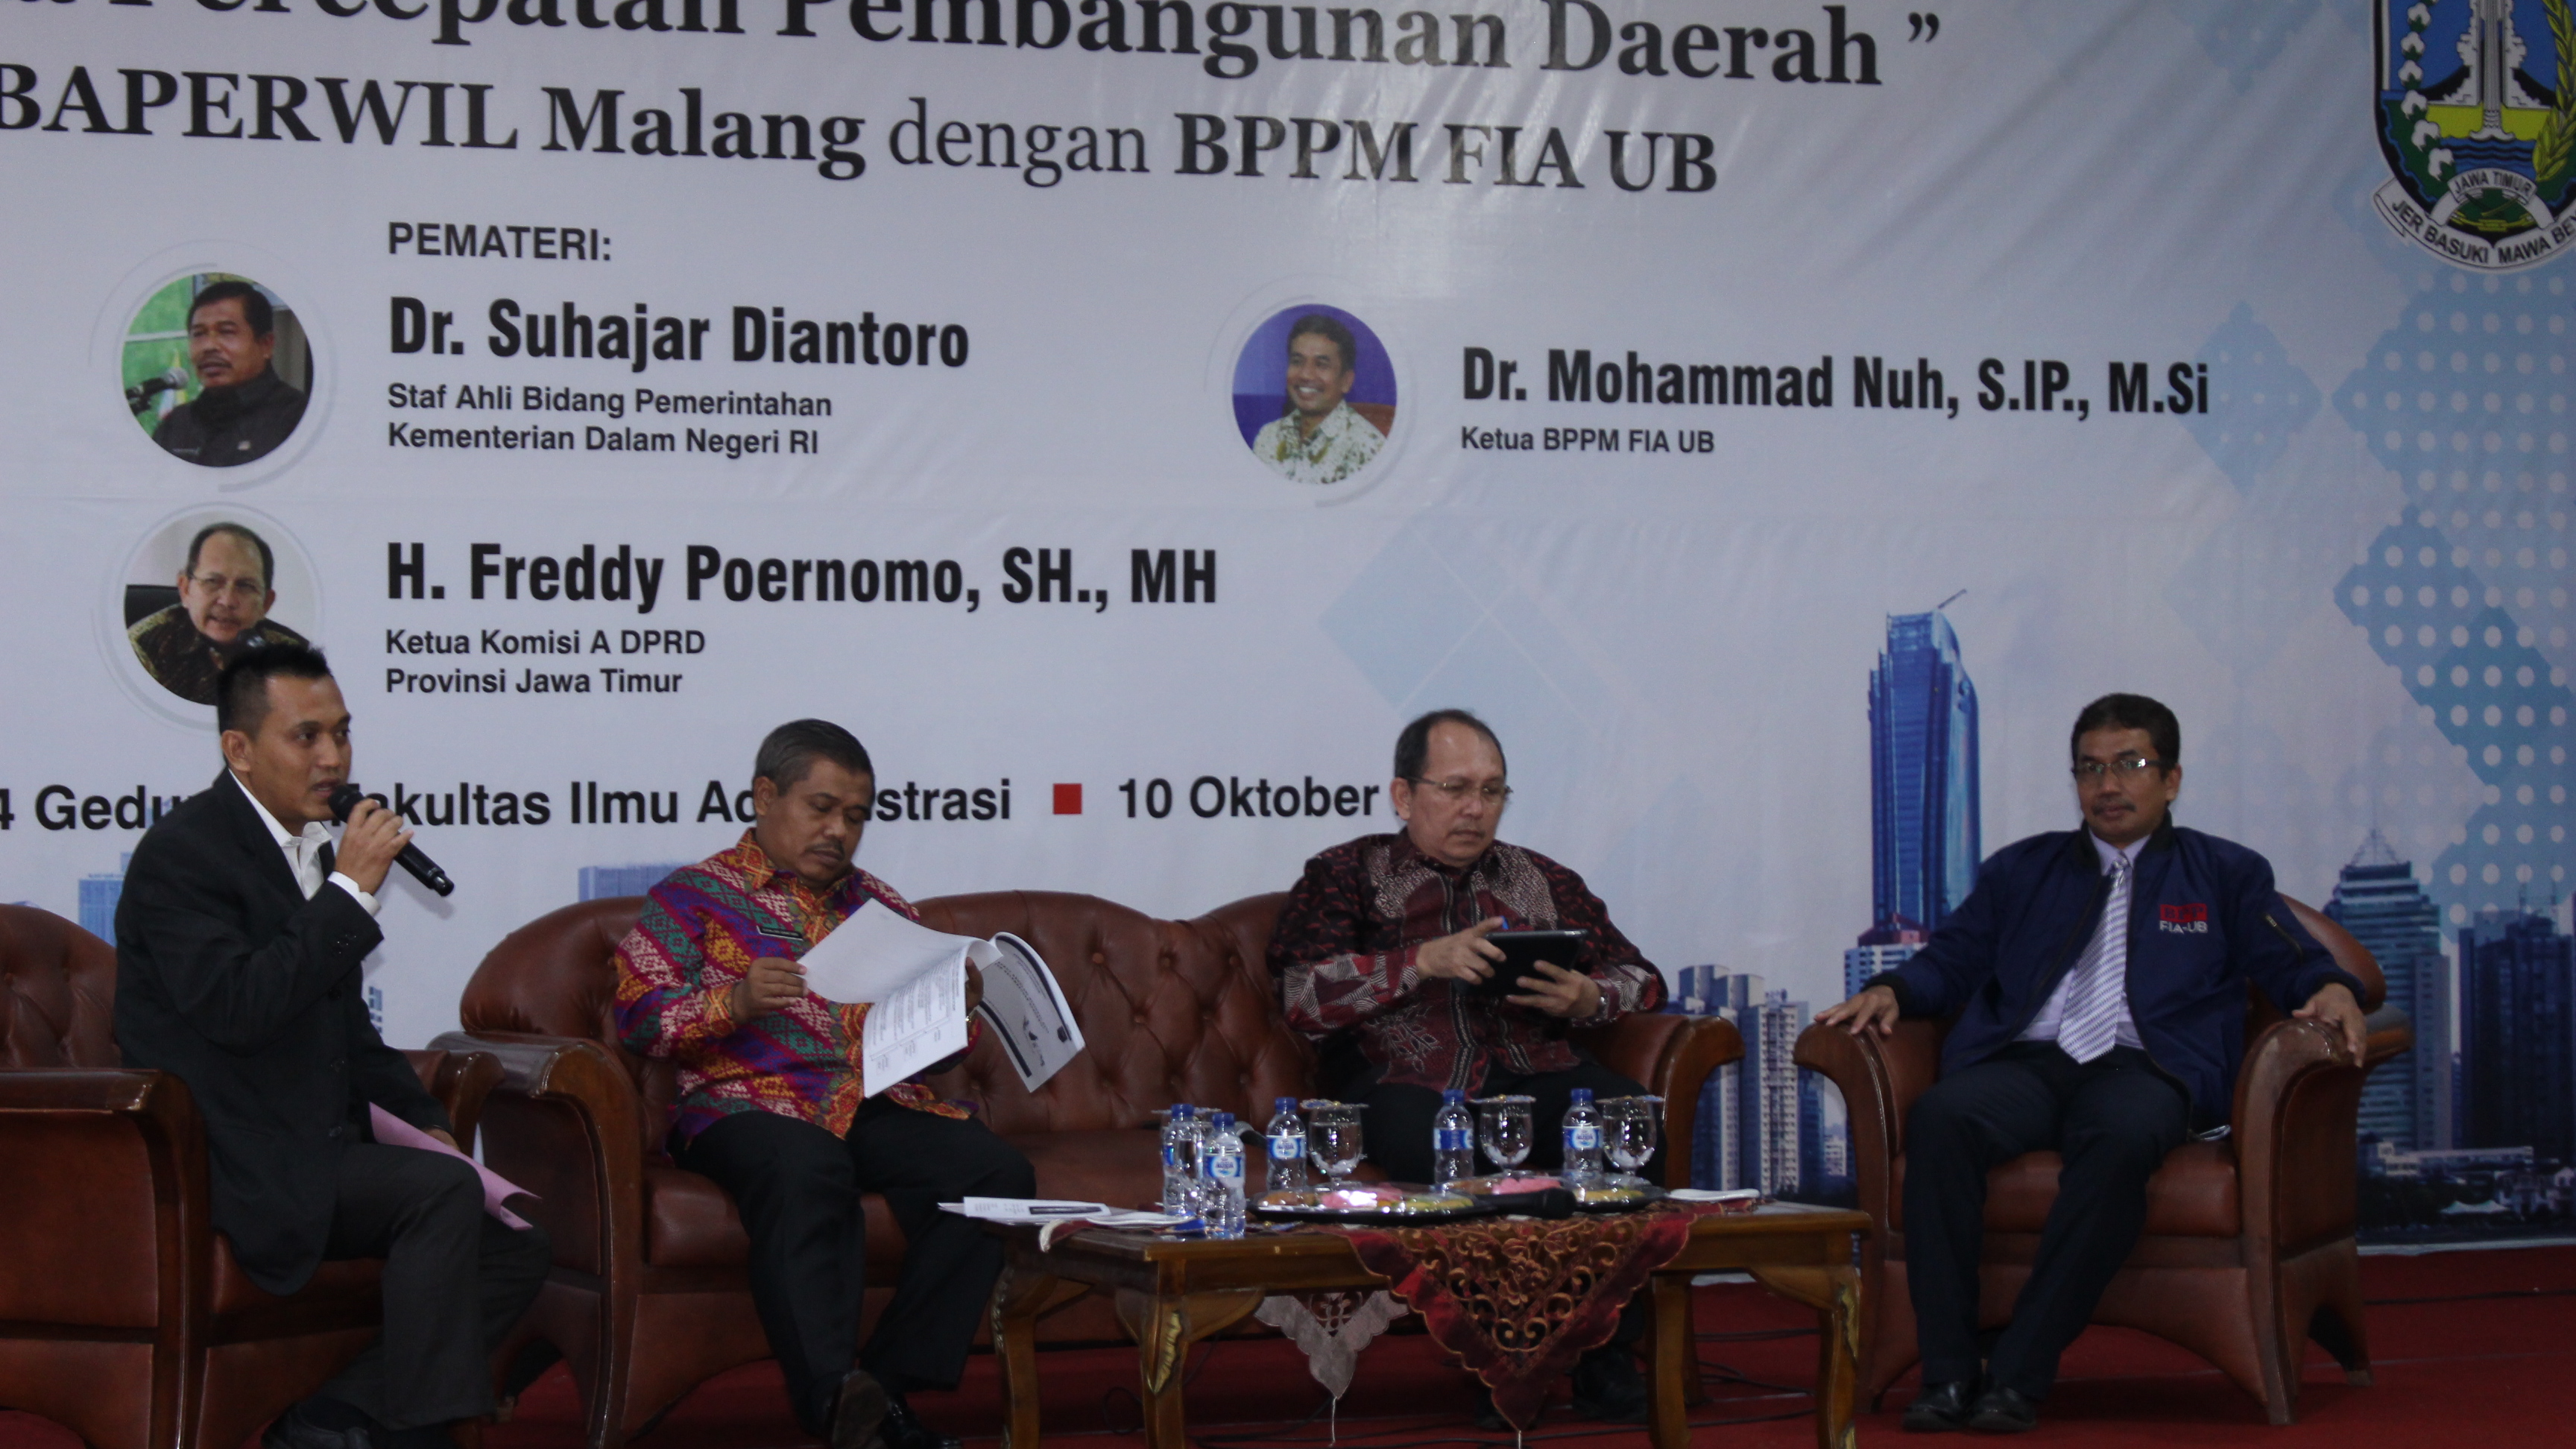 (Ki-ka) Moderator Romy Hermawan, Suhajar Diantoro, Freddy Poernomo, Mohammad Nuh